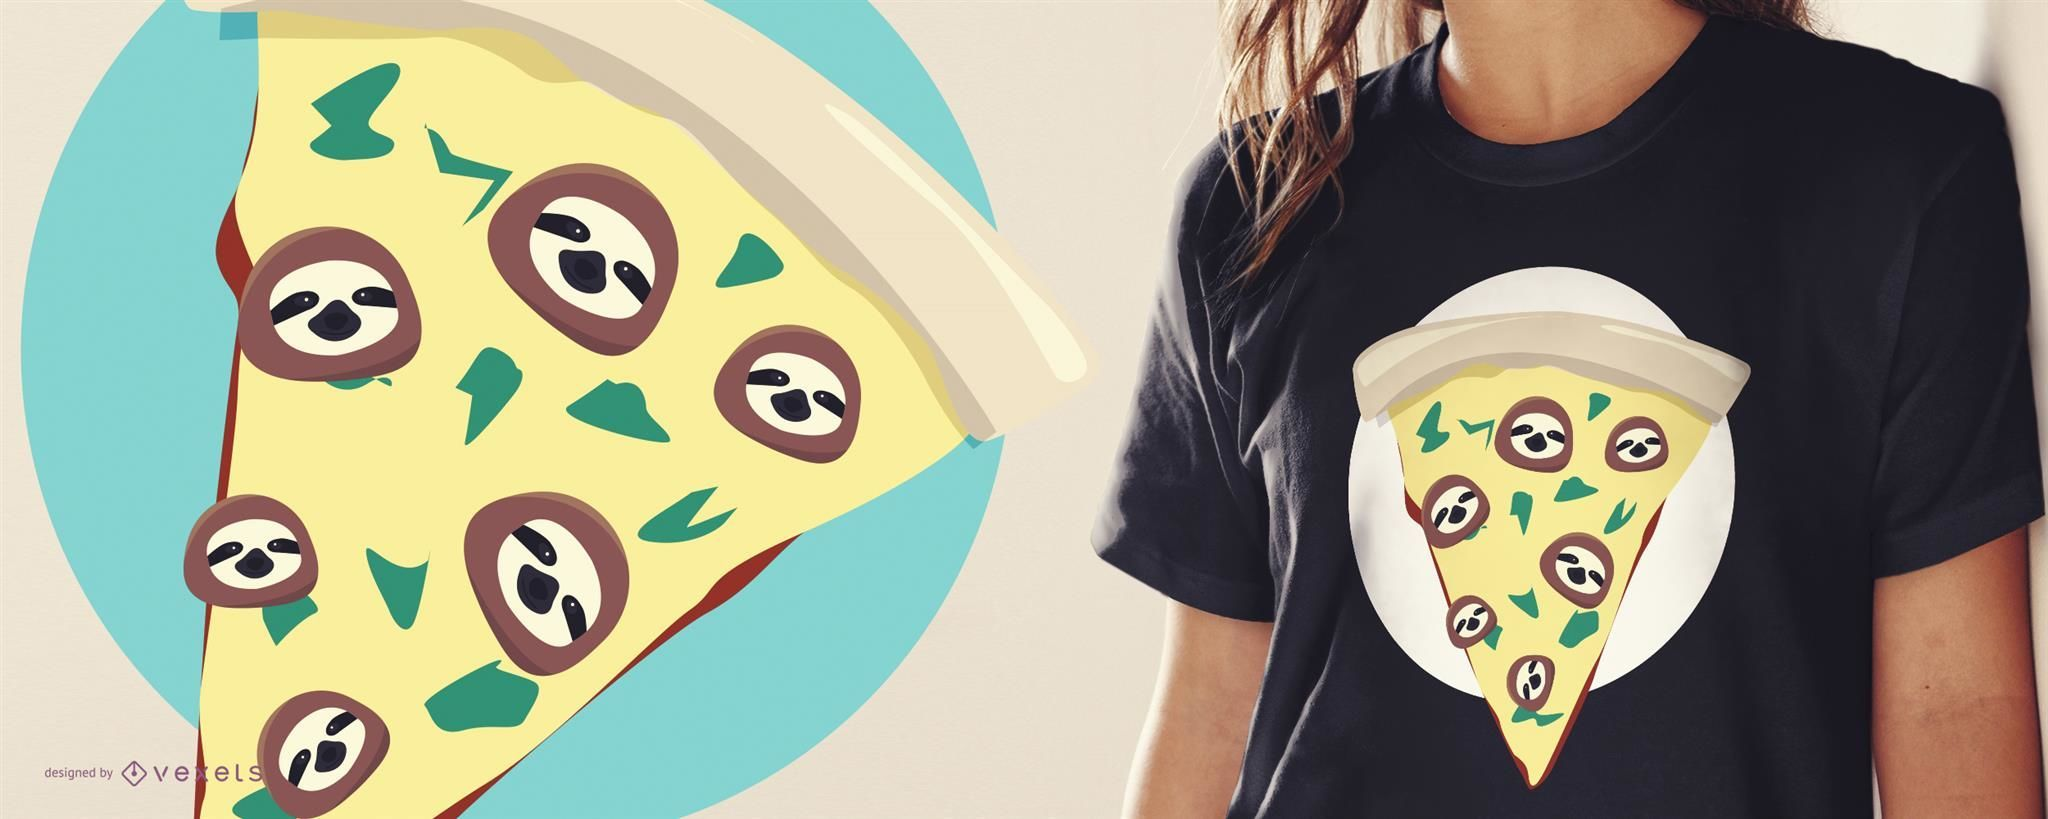 Funny pizza sloth t-shirt design